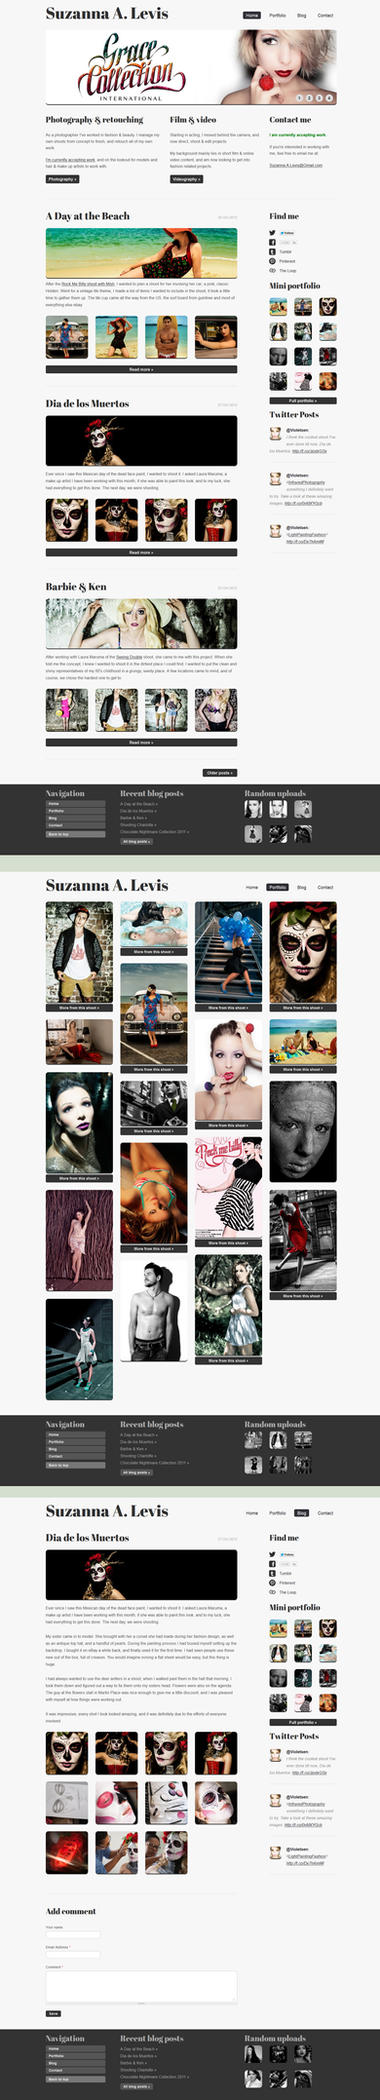 Photography Portfolio Site: Suzanna A Levis by Kiorrik